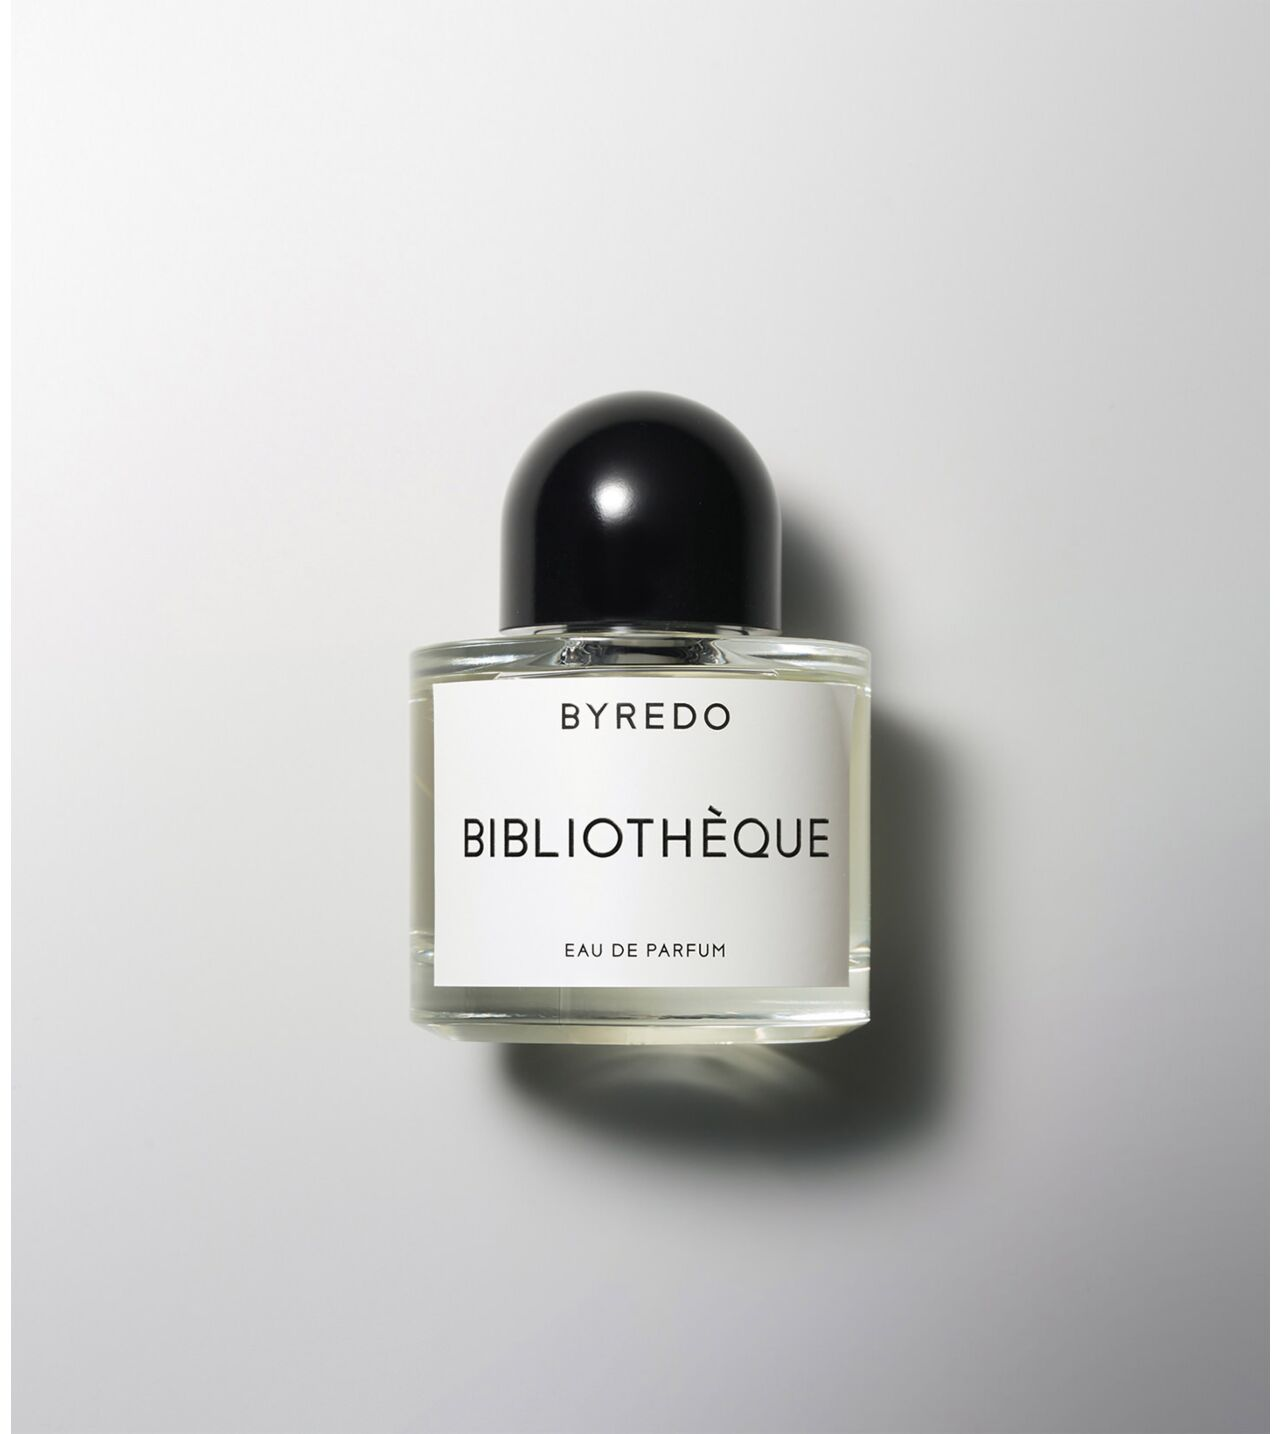 Picture of Byredo Bibliotheque Eau de Parfum